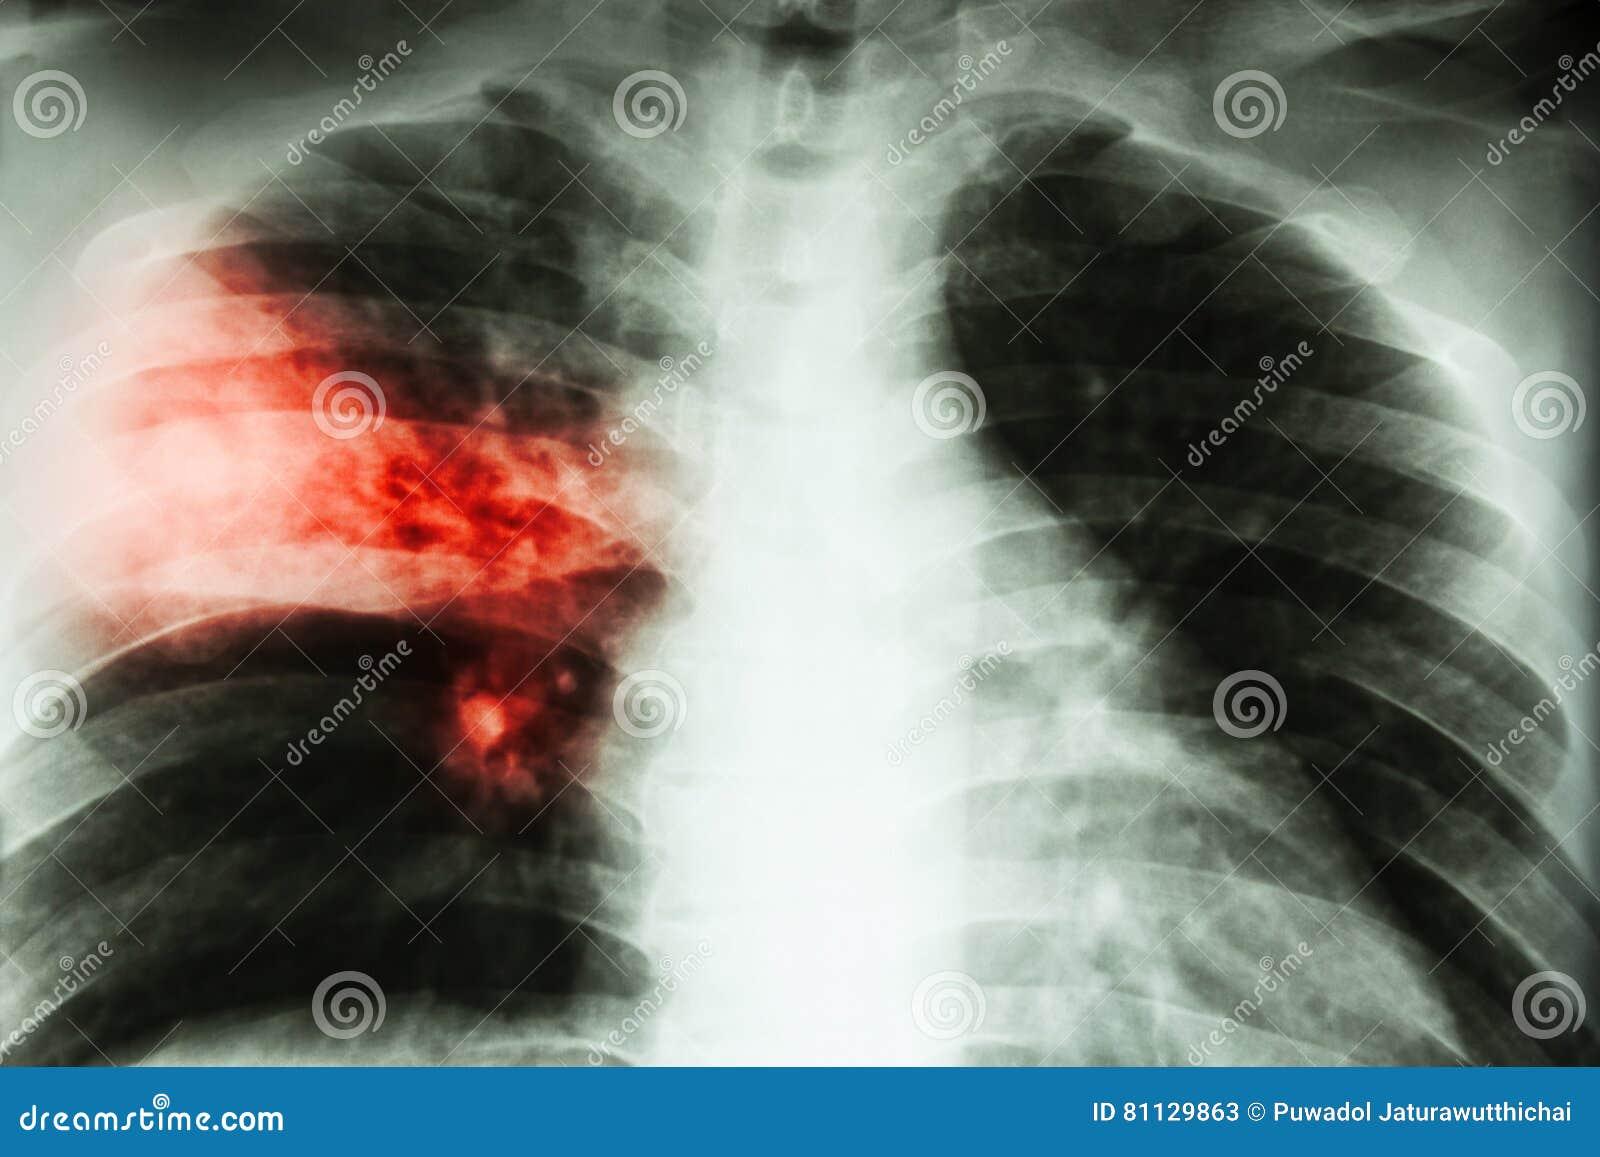 Lobar Pneumonia Film Chest X Ray Show Alveolar Infiltration At